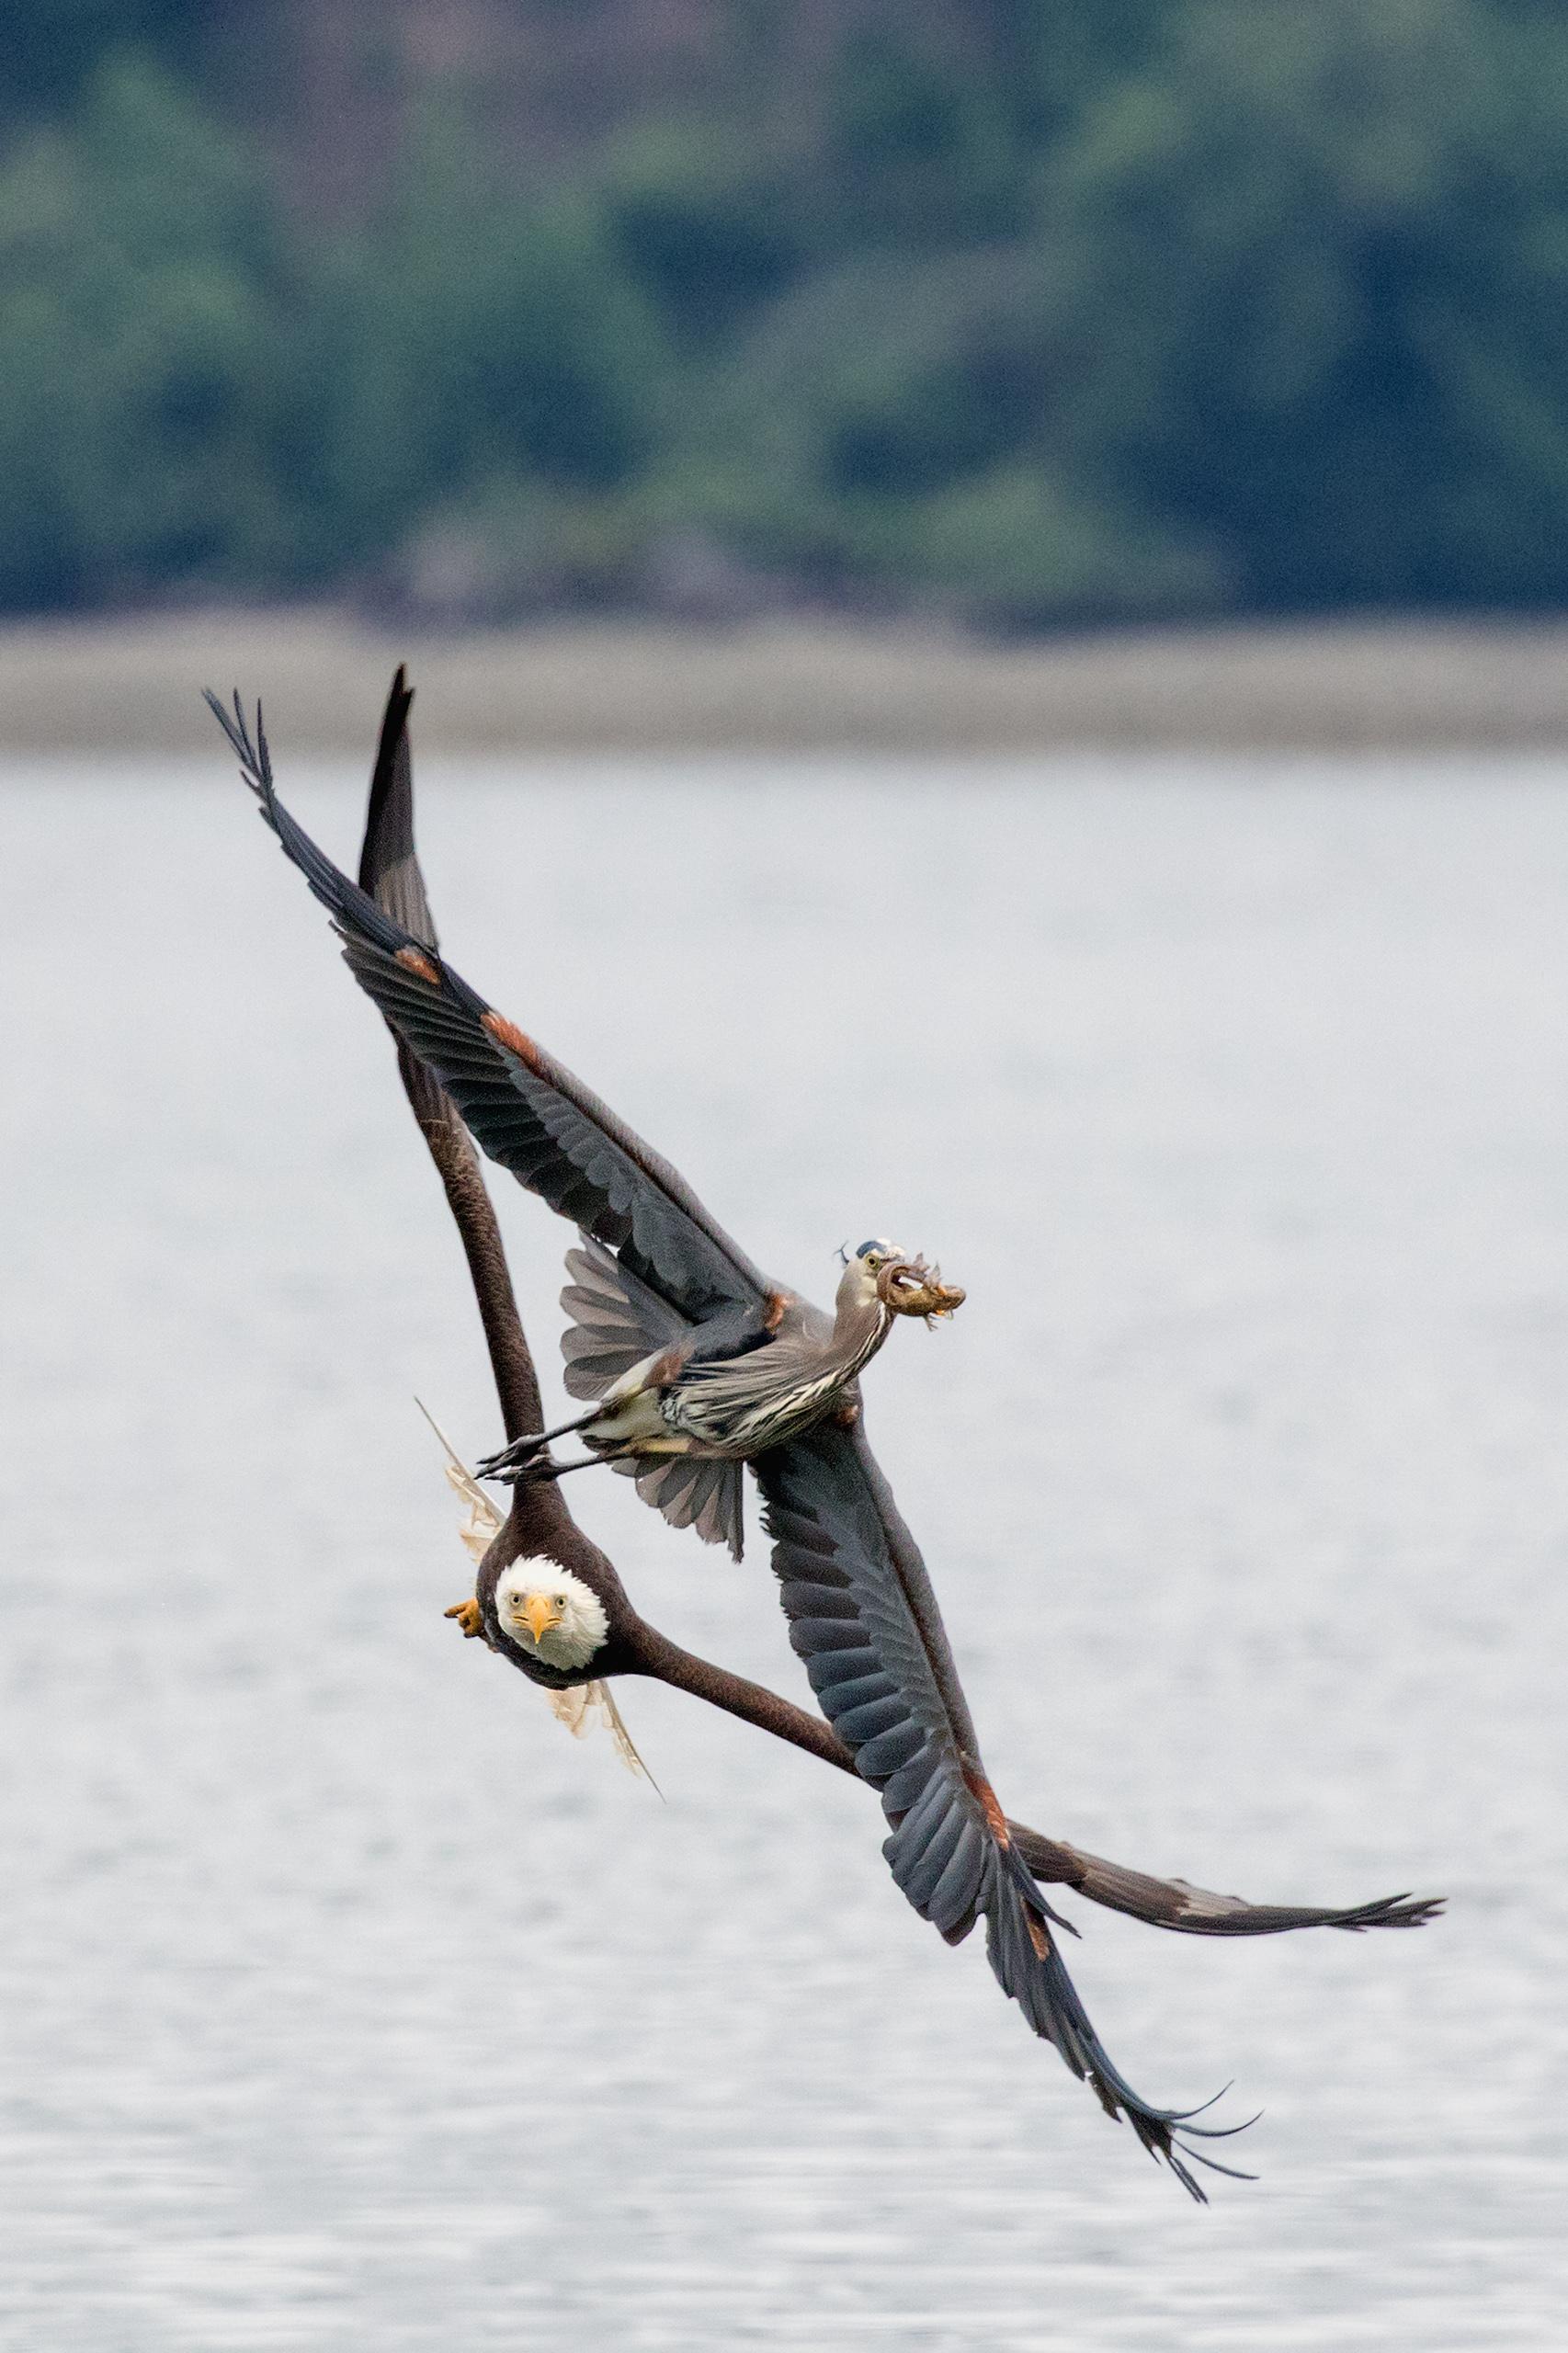 Bald eagle chasing great blue heron, Hood Canal, Washington, 2015.